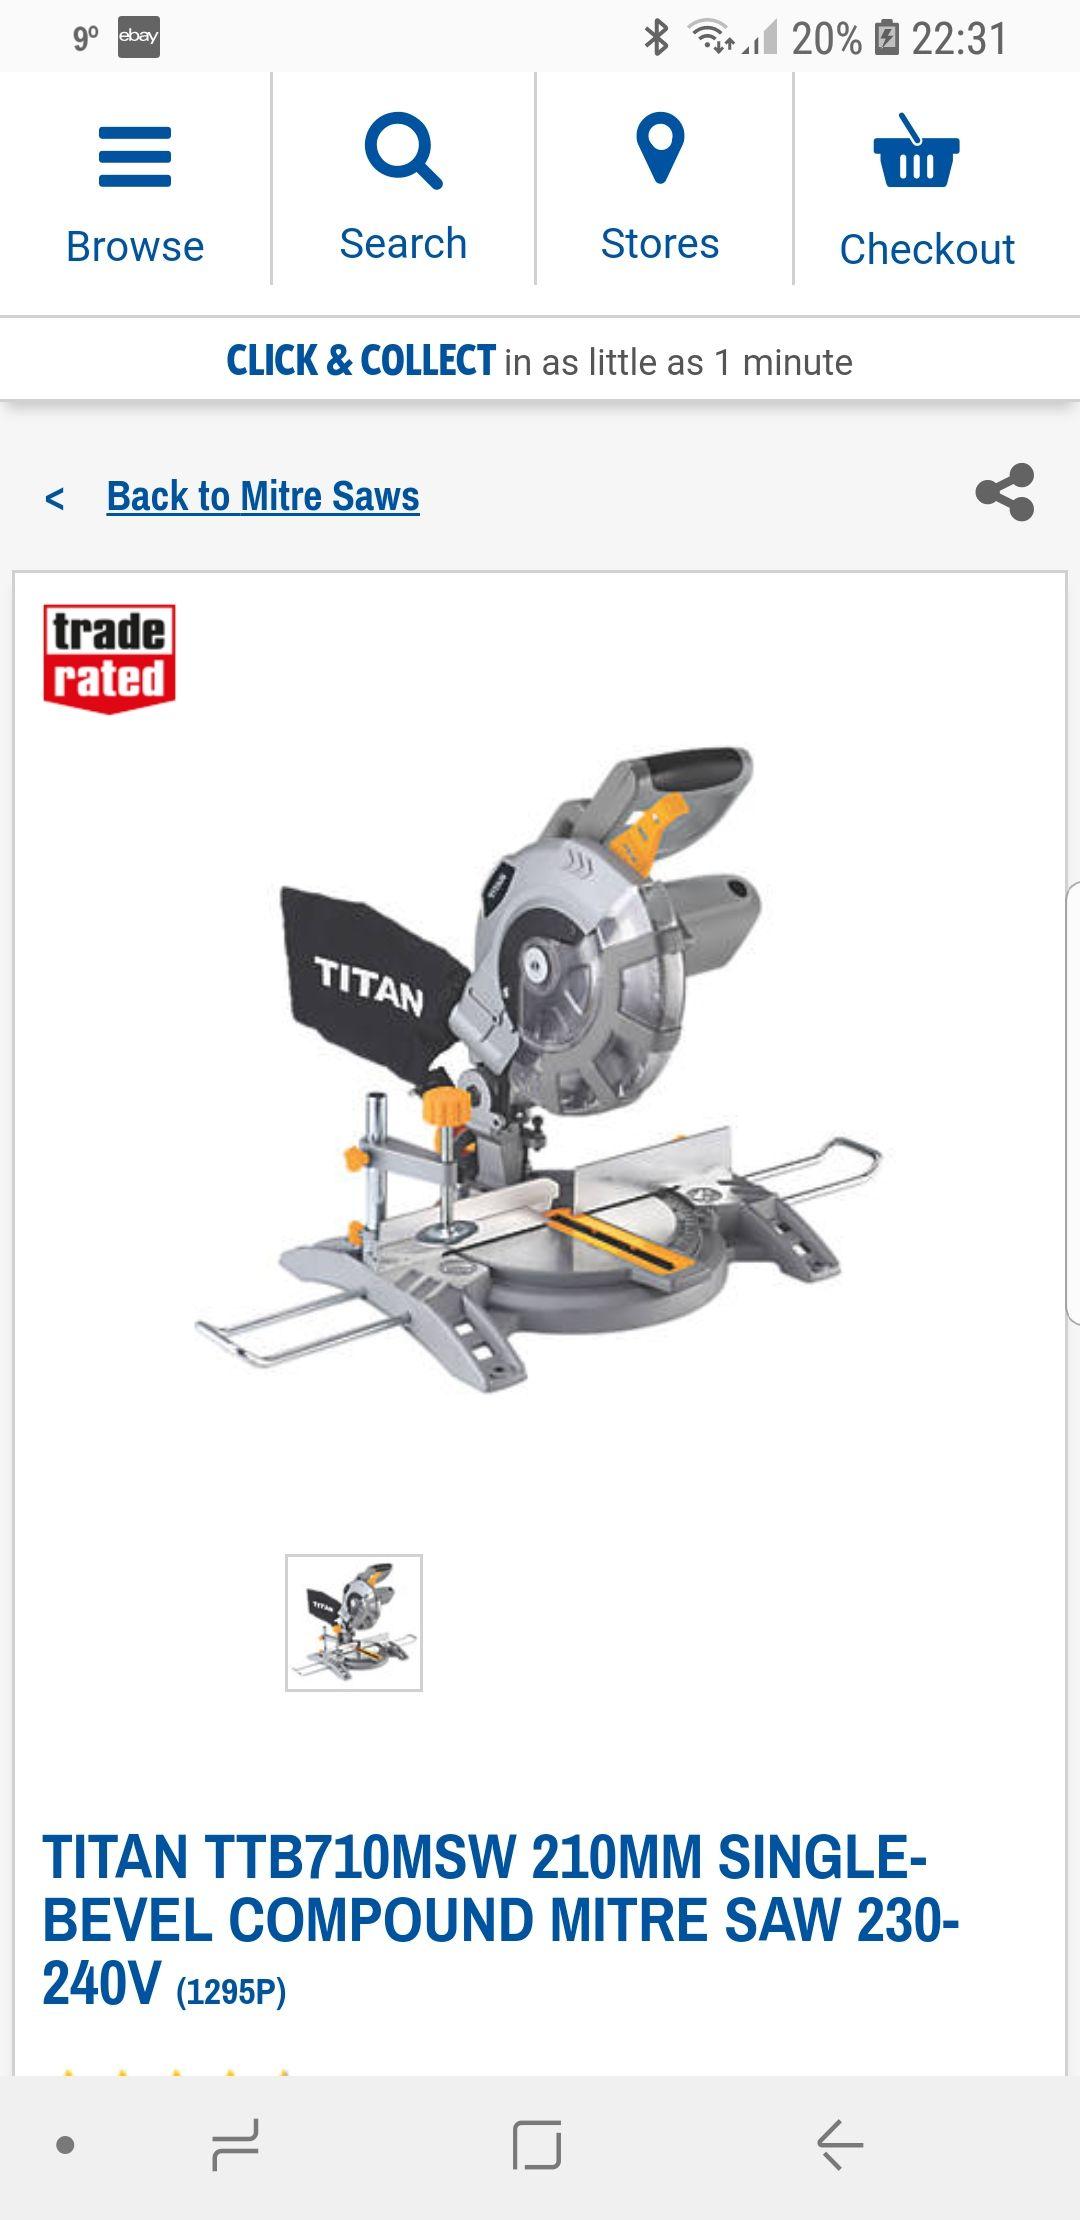 Titan Mitre Saw £49.99  Screwfix